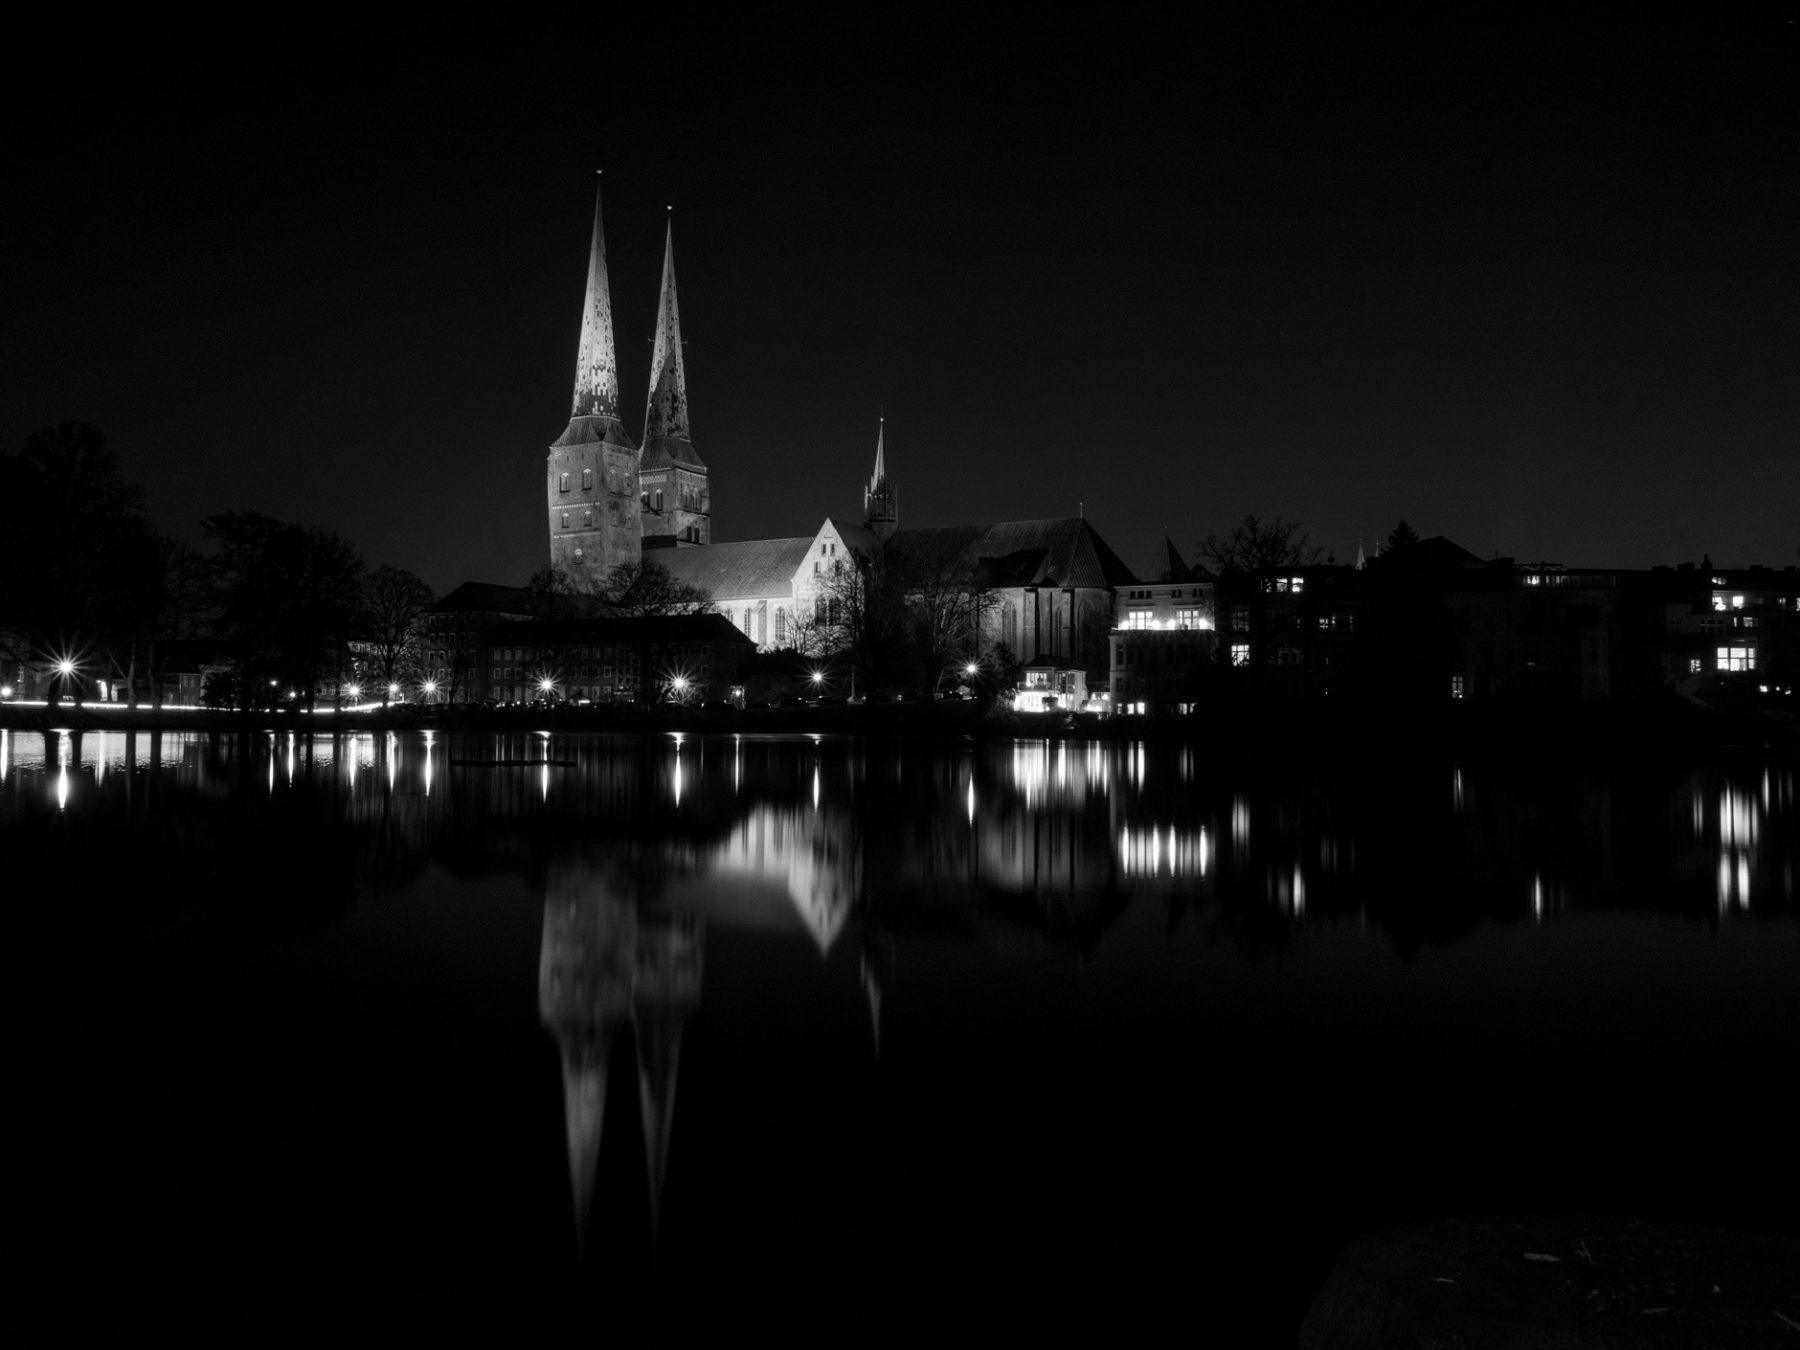 Katedralen i Lübeck - natfotografering